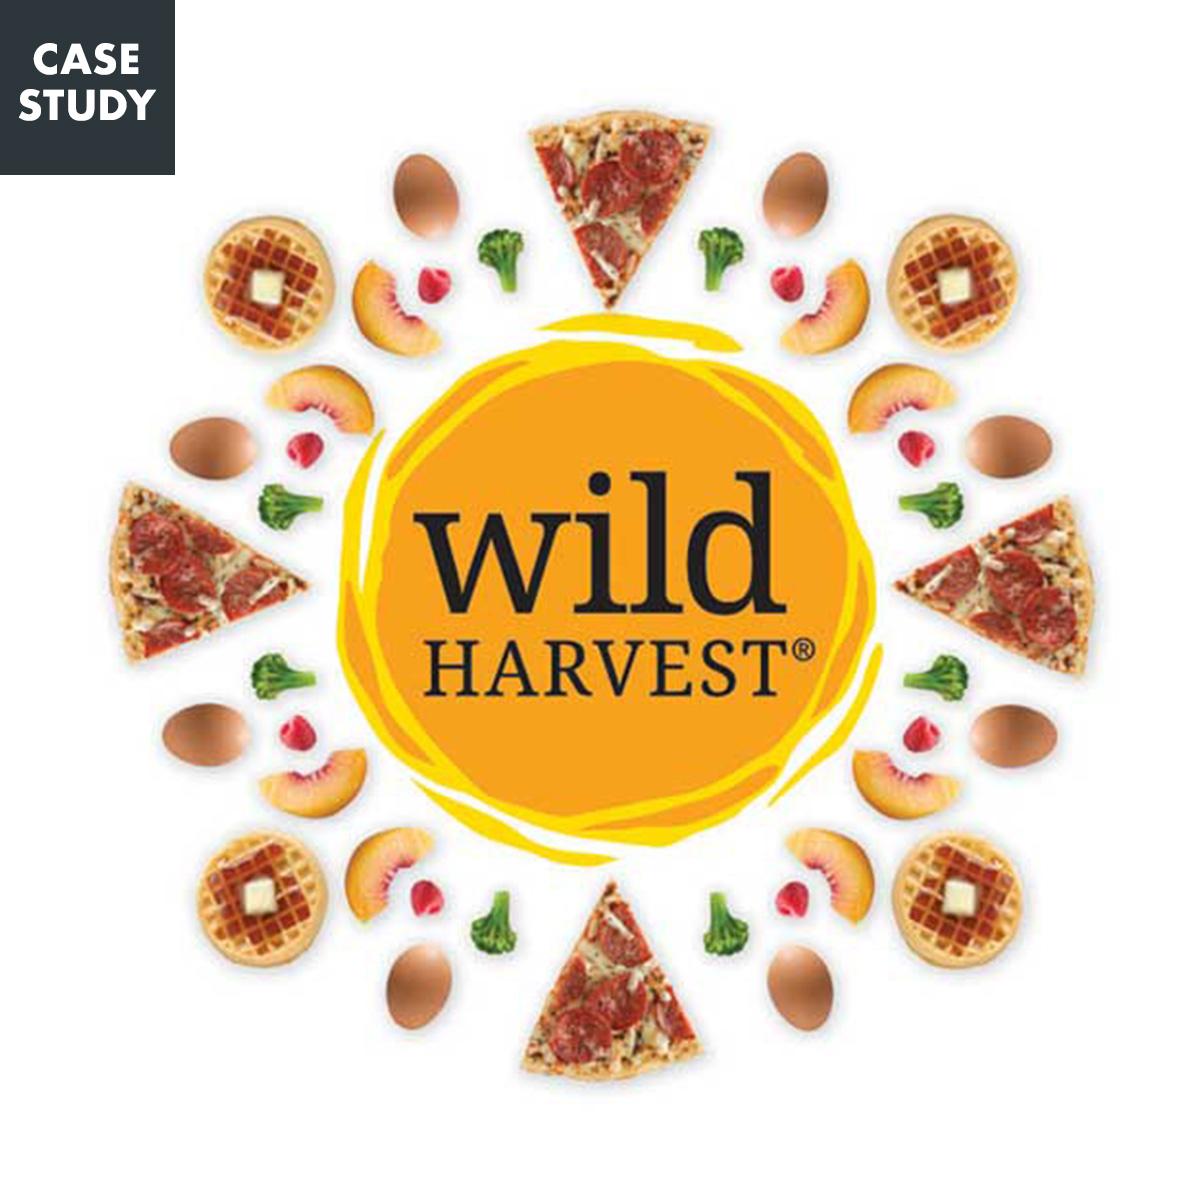 Case study: Wild Harvest